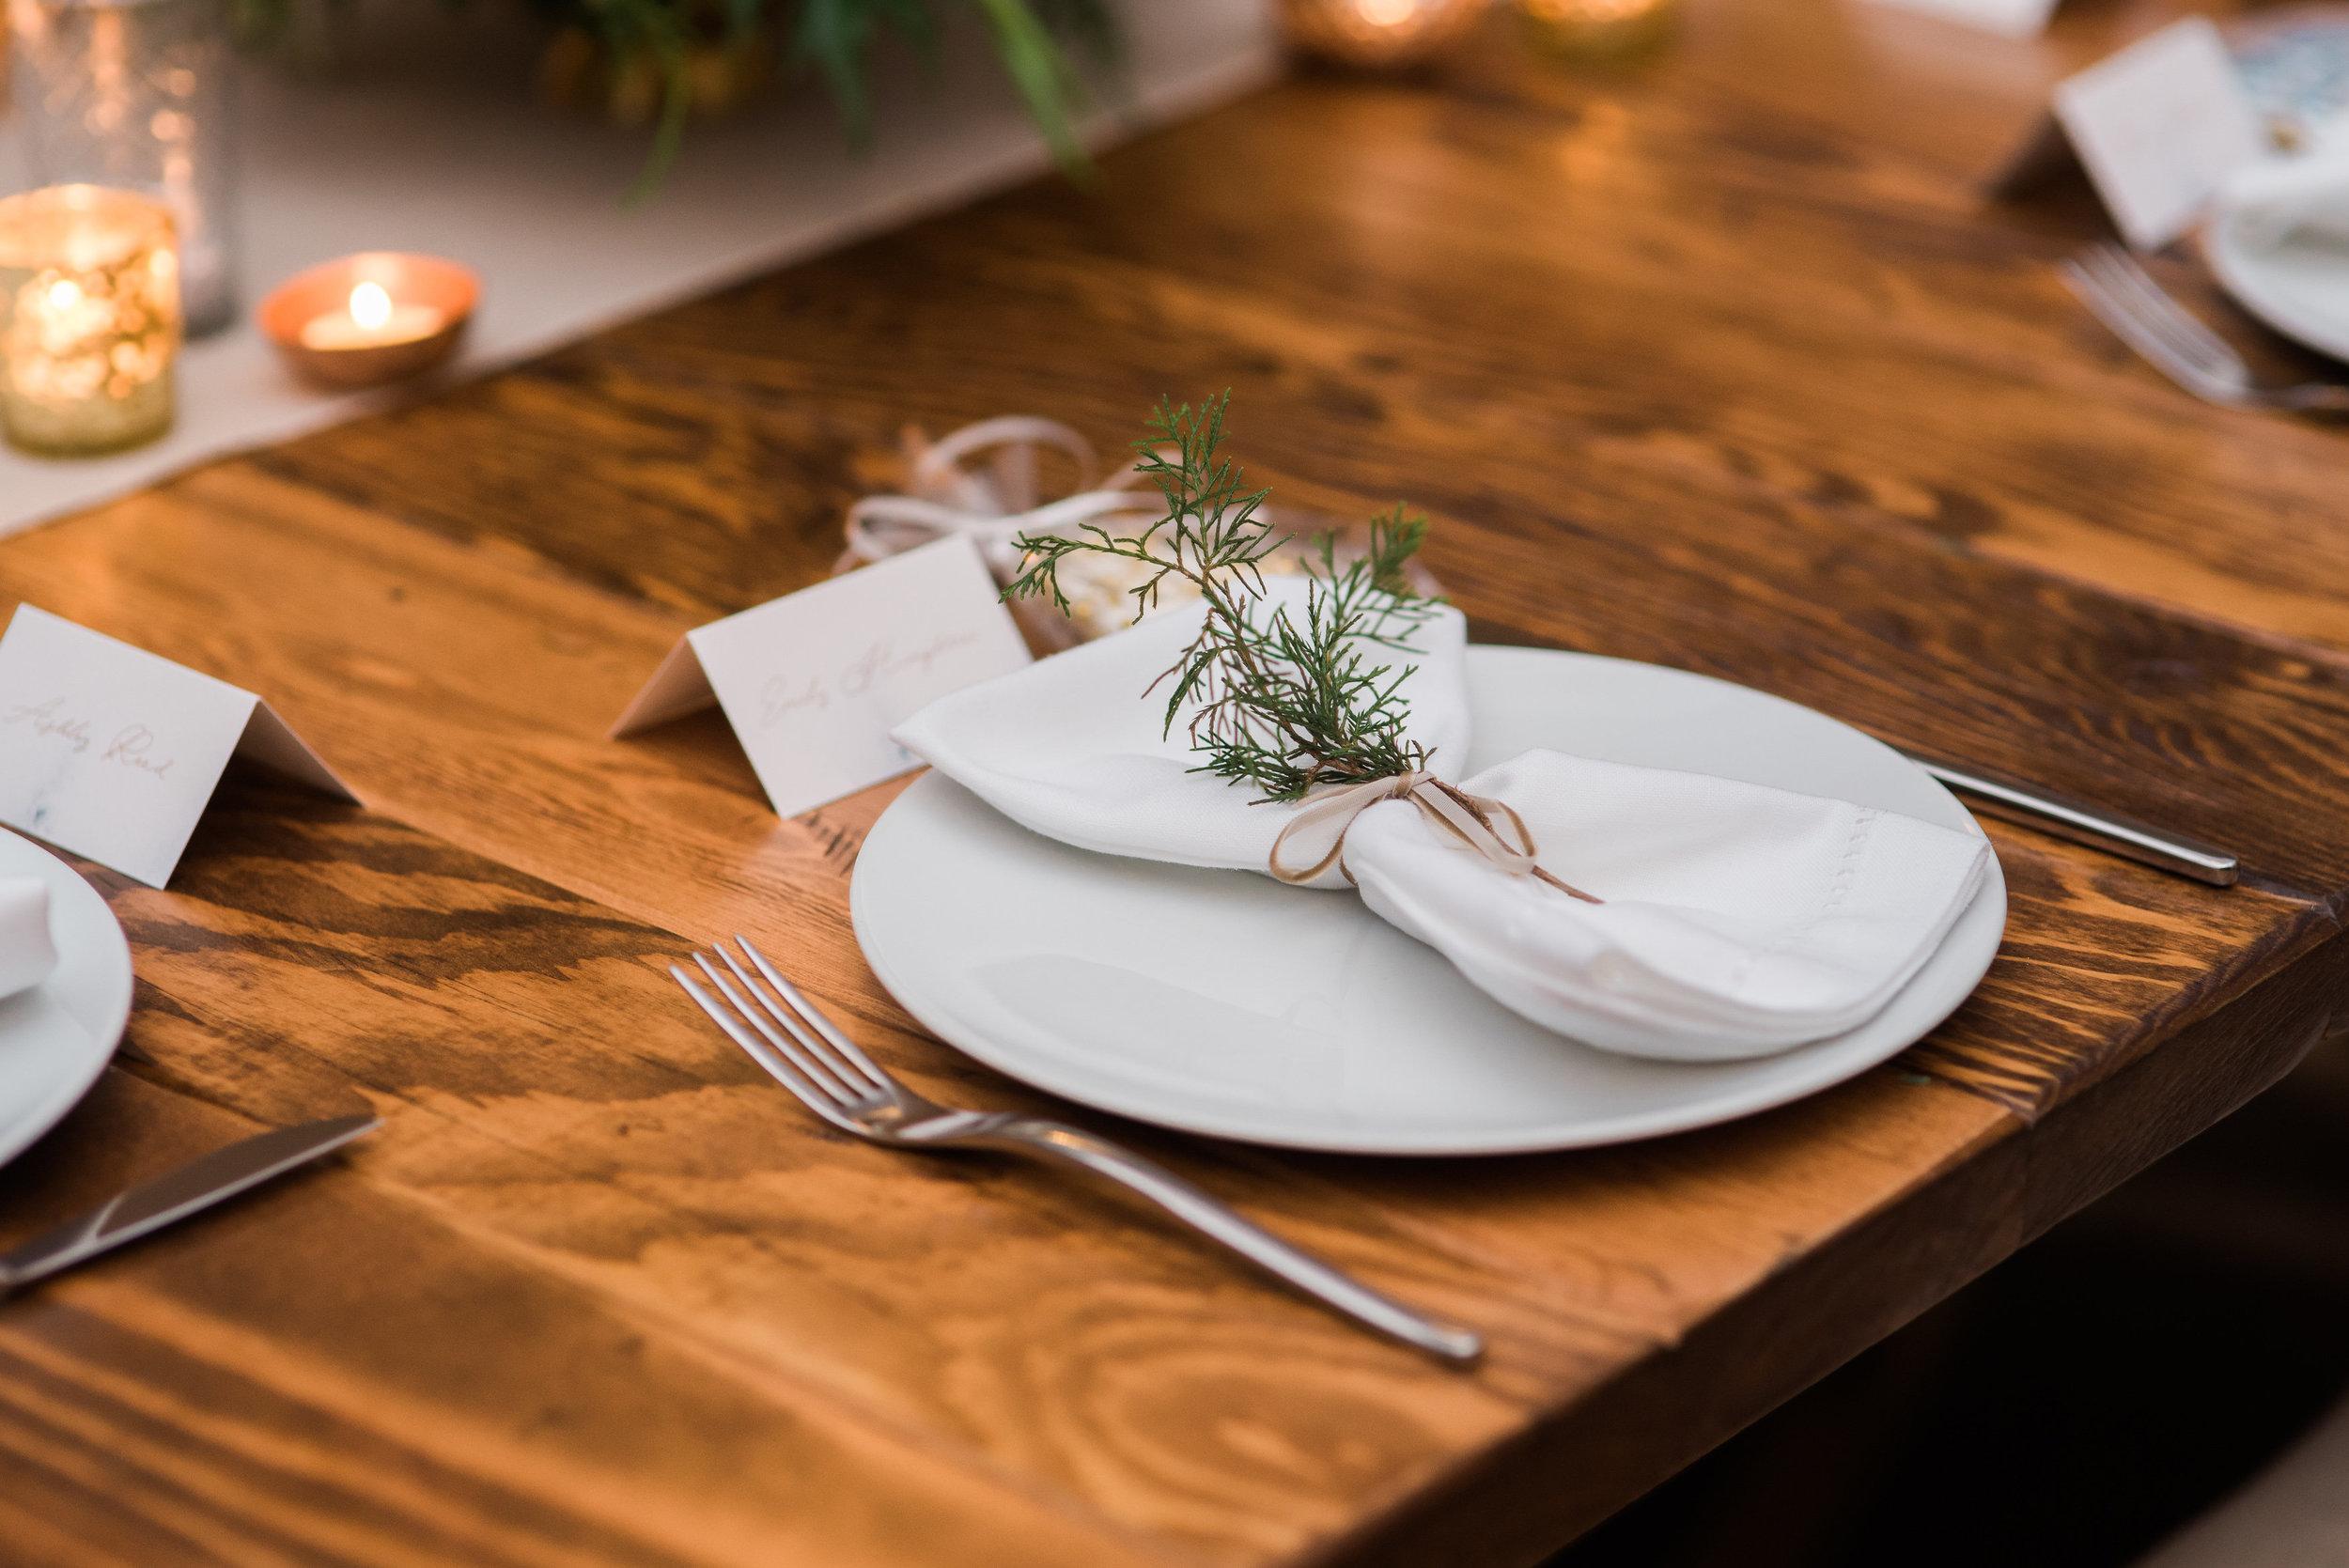 napkin tied with greenery.jpg